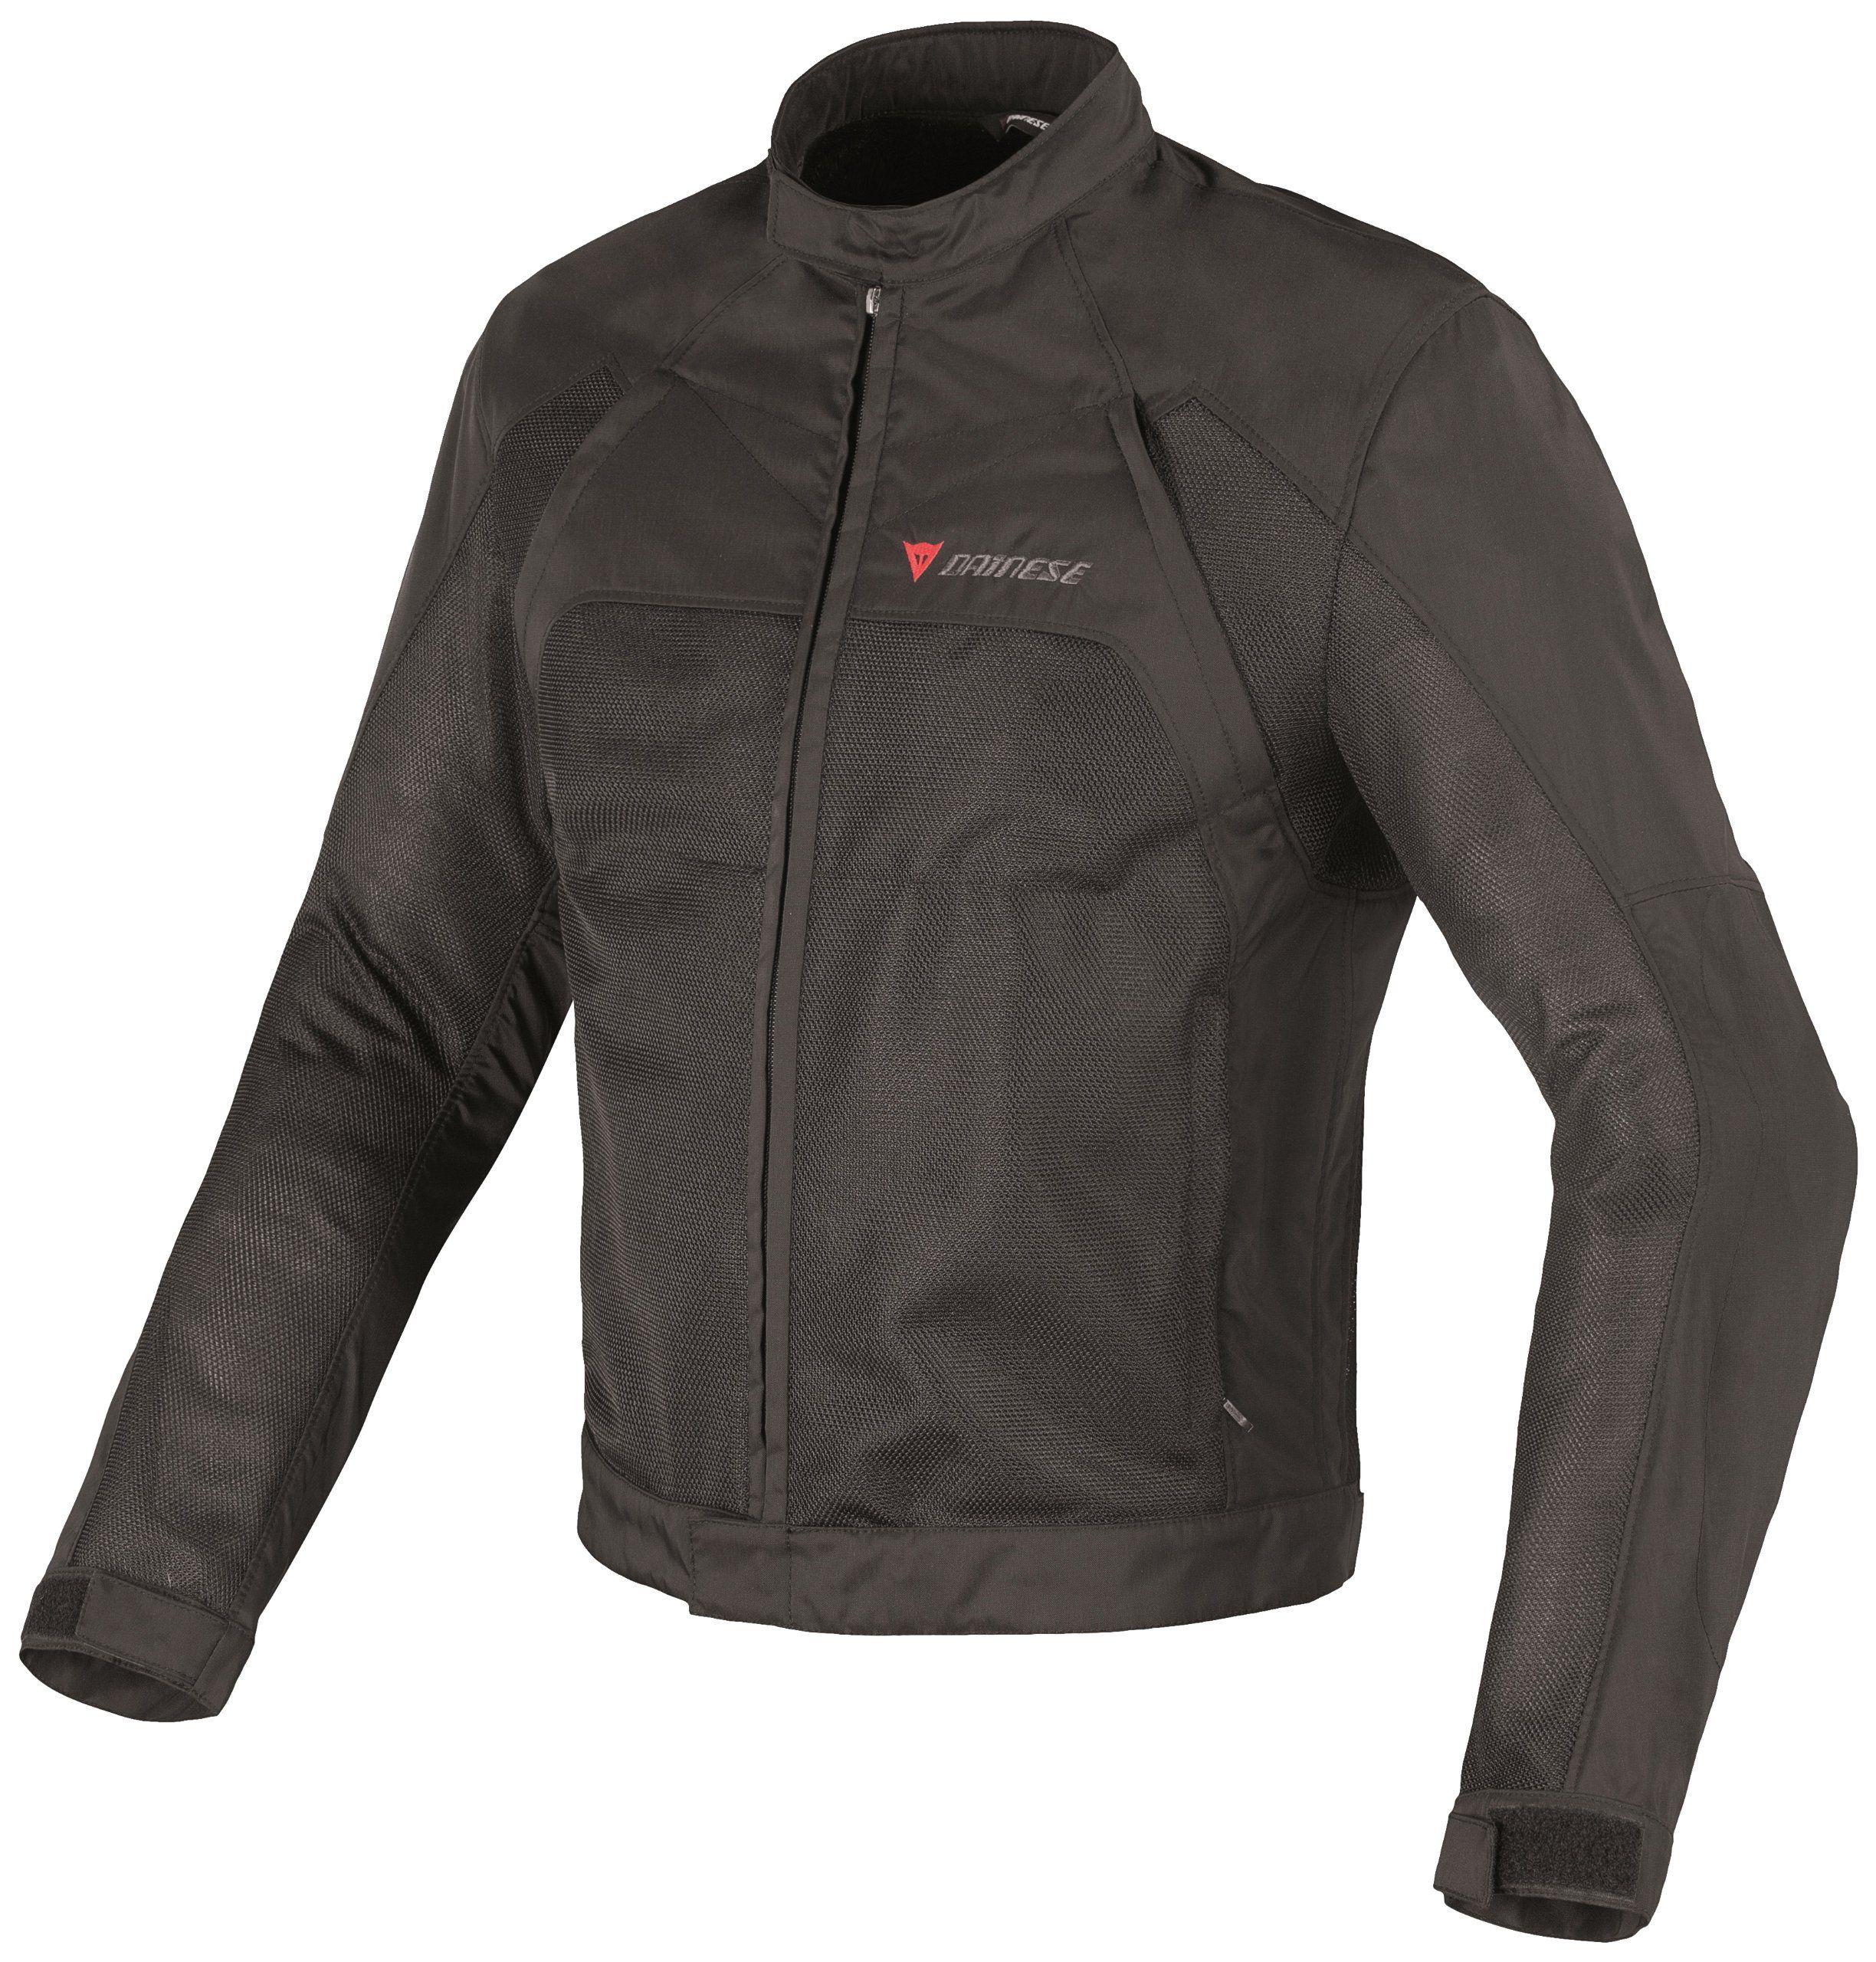 CHEST ZIPPER - Amazon.com: Dainese G. Air-Flux Men's Textile Street Racing Motorcycle Jacket - Nero / 54: Automotive